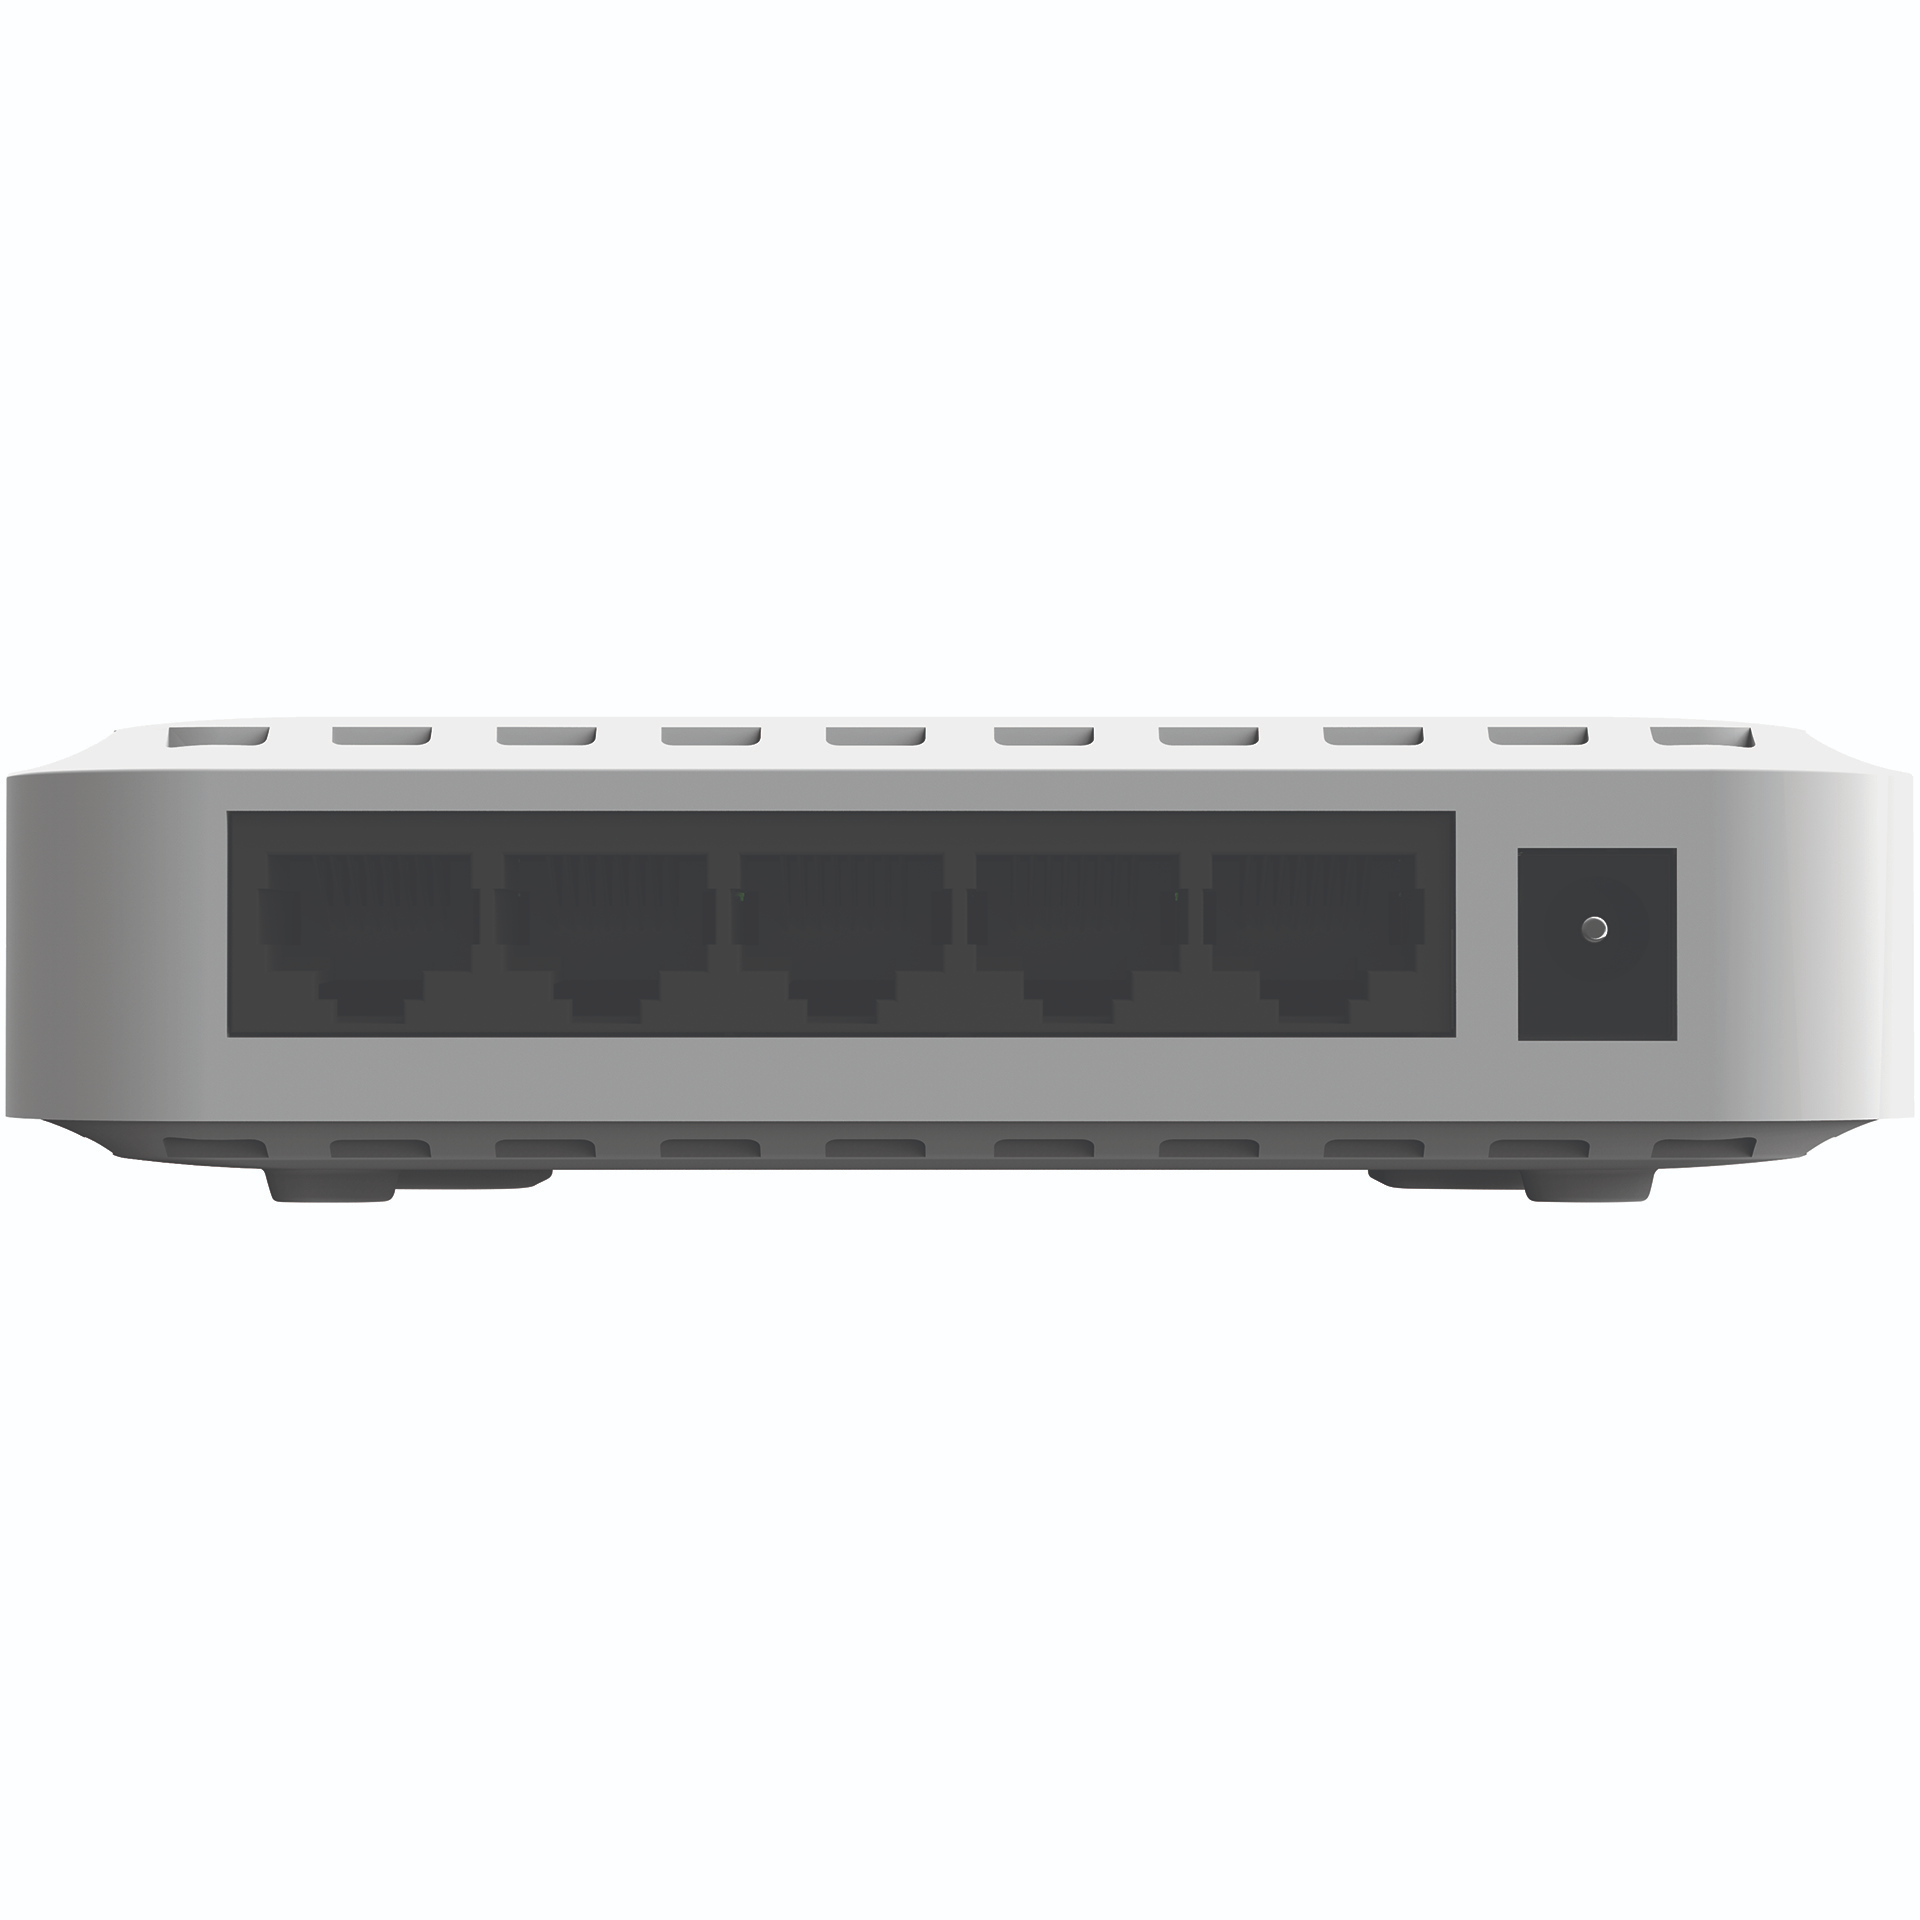 5-pordine Gigabit switch Netgear GS605